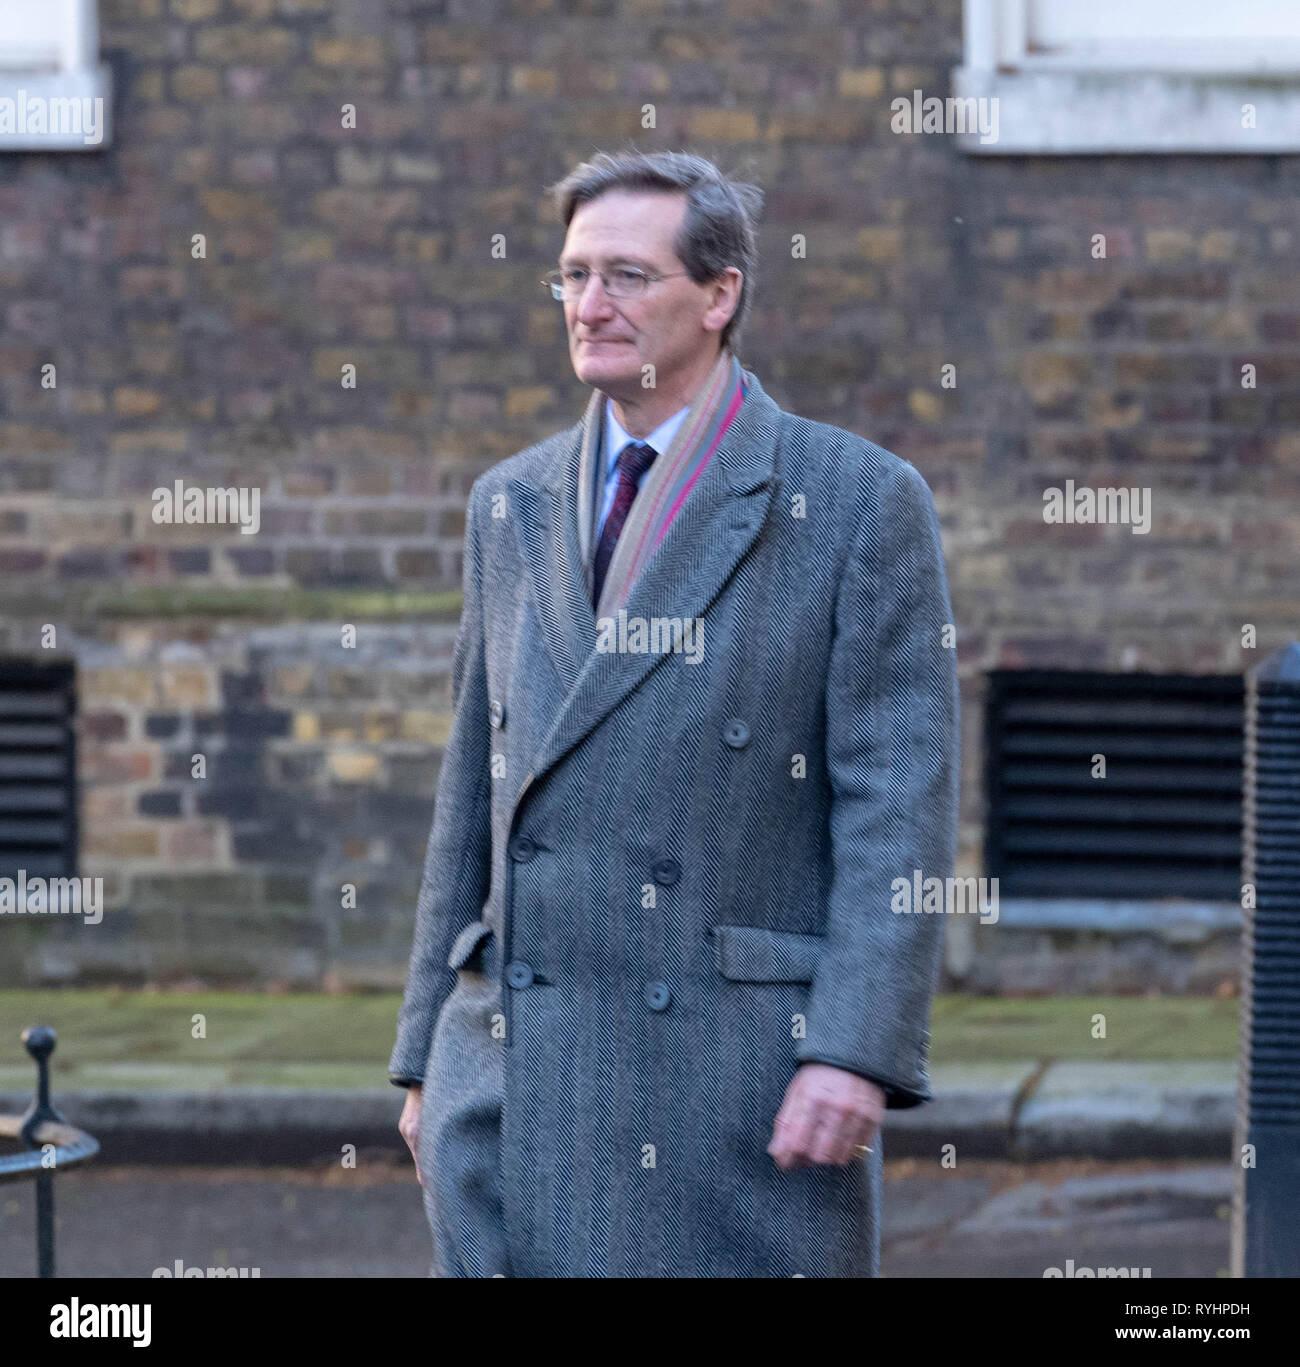 London, UK. 14th Mar 2019. Dominic Grieve MP arrives at 10 Downing Street, London Credit: Ian Davidson/Alamy Live News Stock Photo